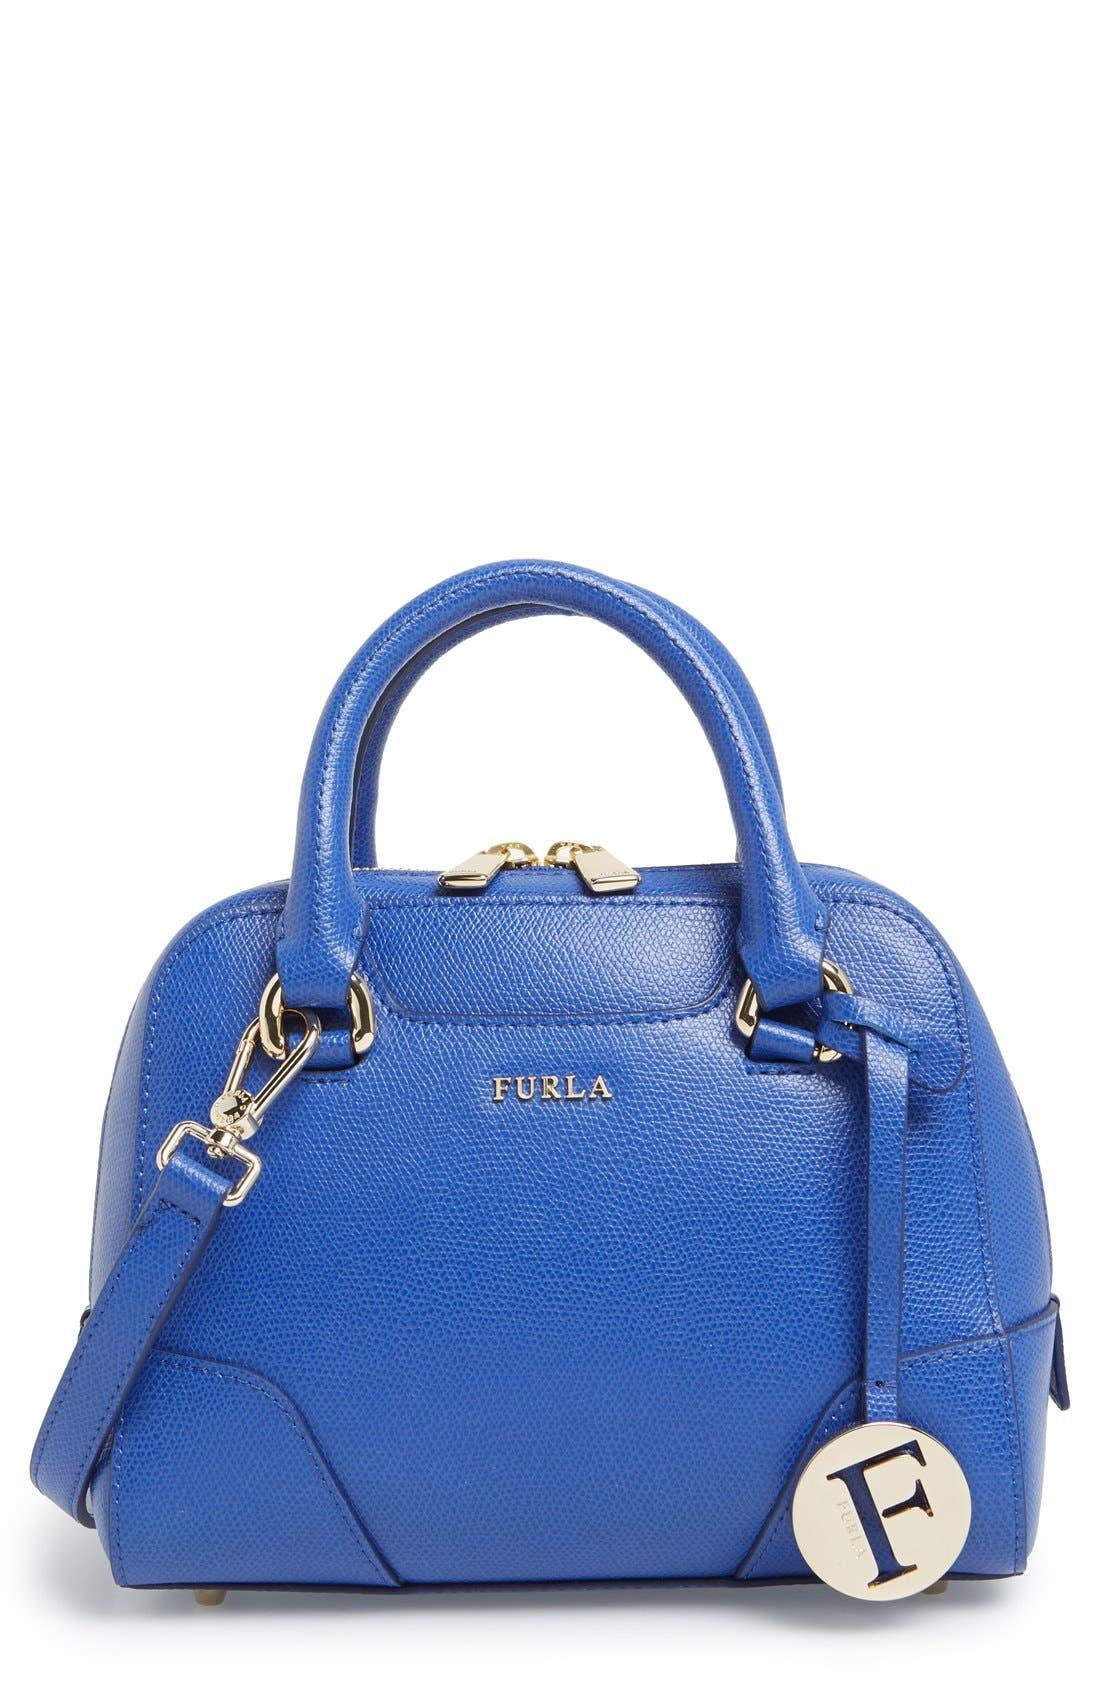 Main Image - Furla 'Dolly - Mini' Leather Satchel